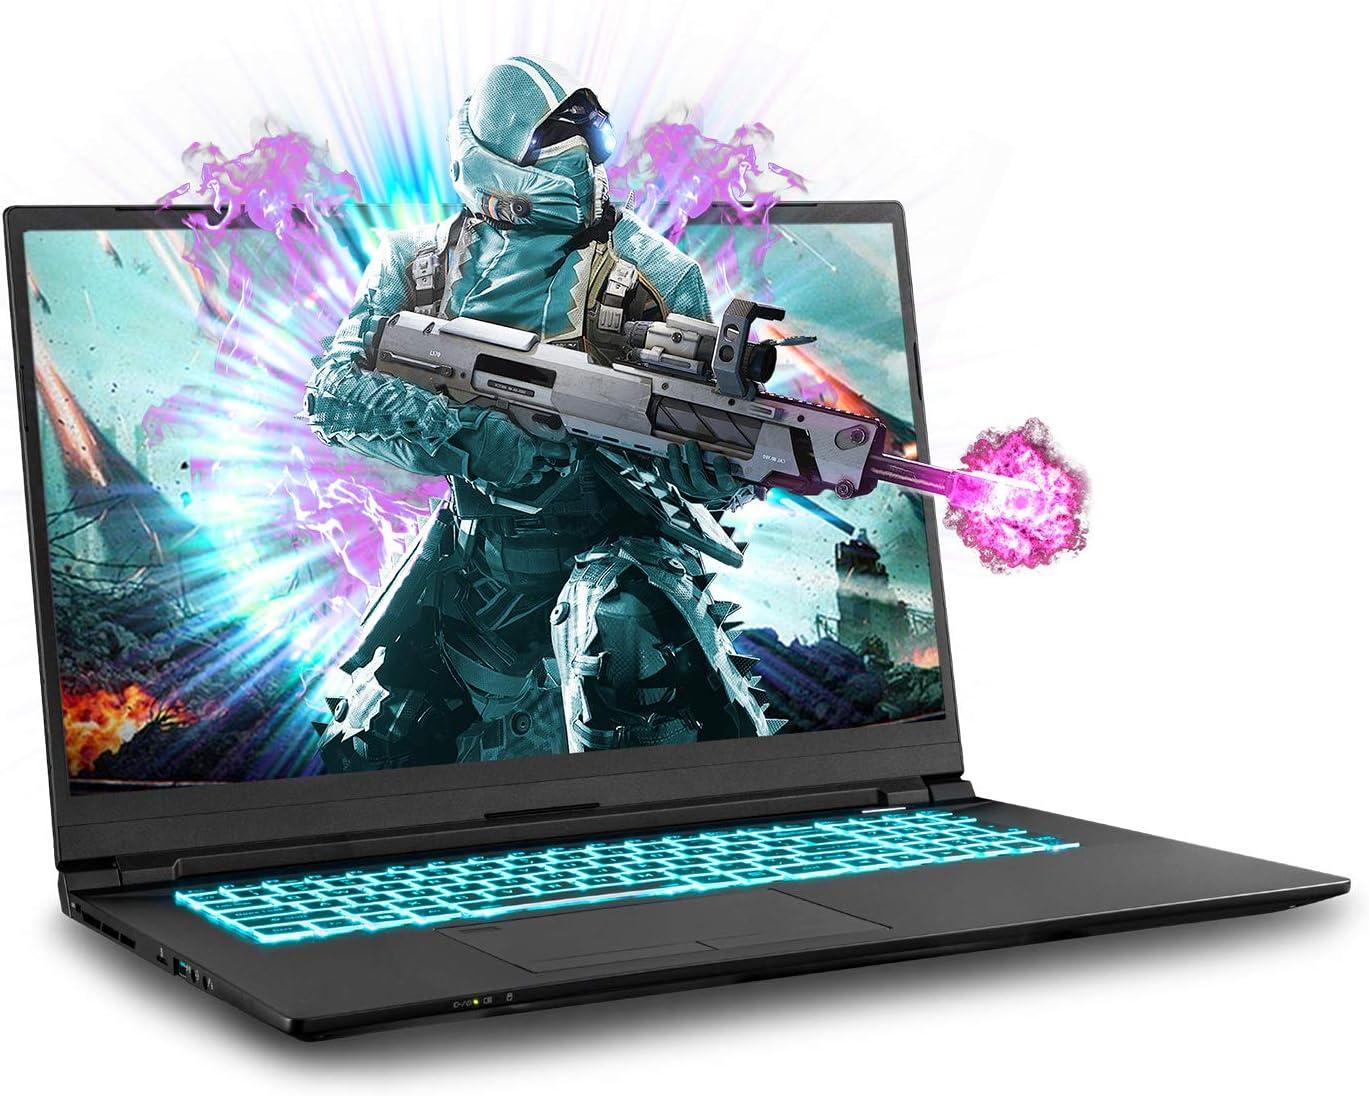 Sager NP8770N2 0.78-Inch Thin, 17.3-Inch FHD 144Hz Gaming Laptop, Intel i7-10875H, RTX 2080 Super, 32GB 3200 RAM, 1TB NVMe SSD, TBT 3, Win 10